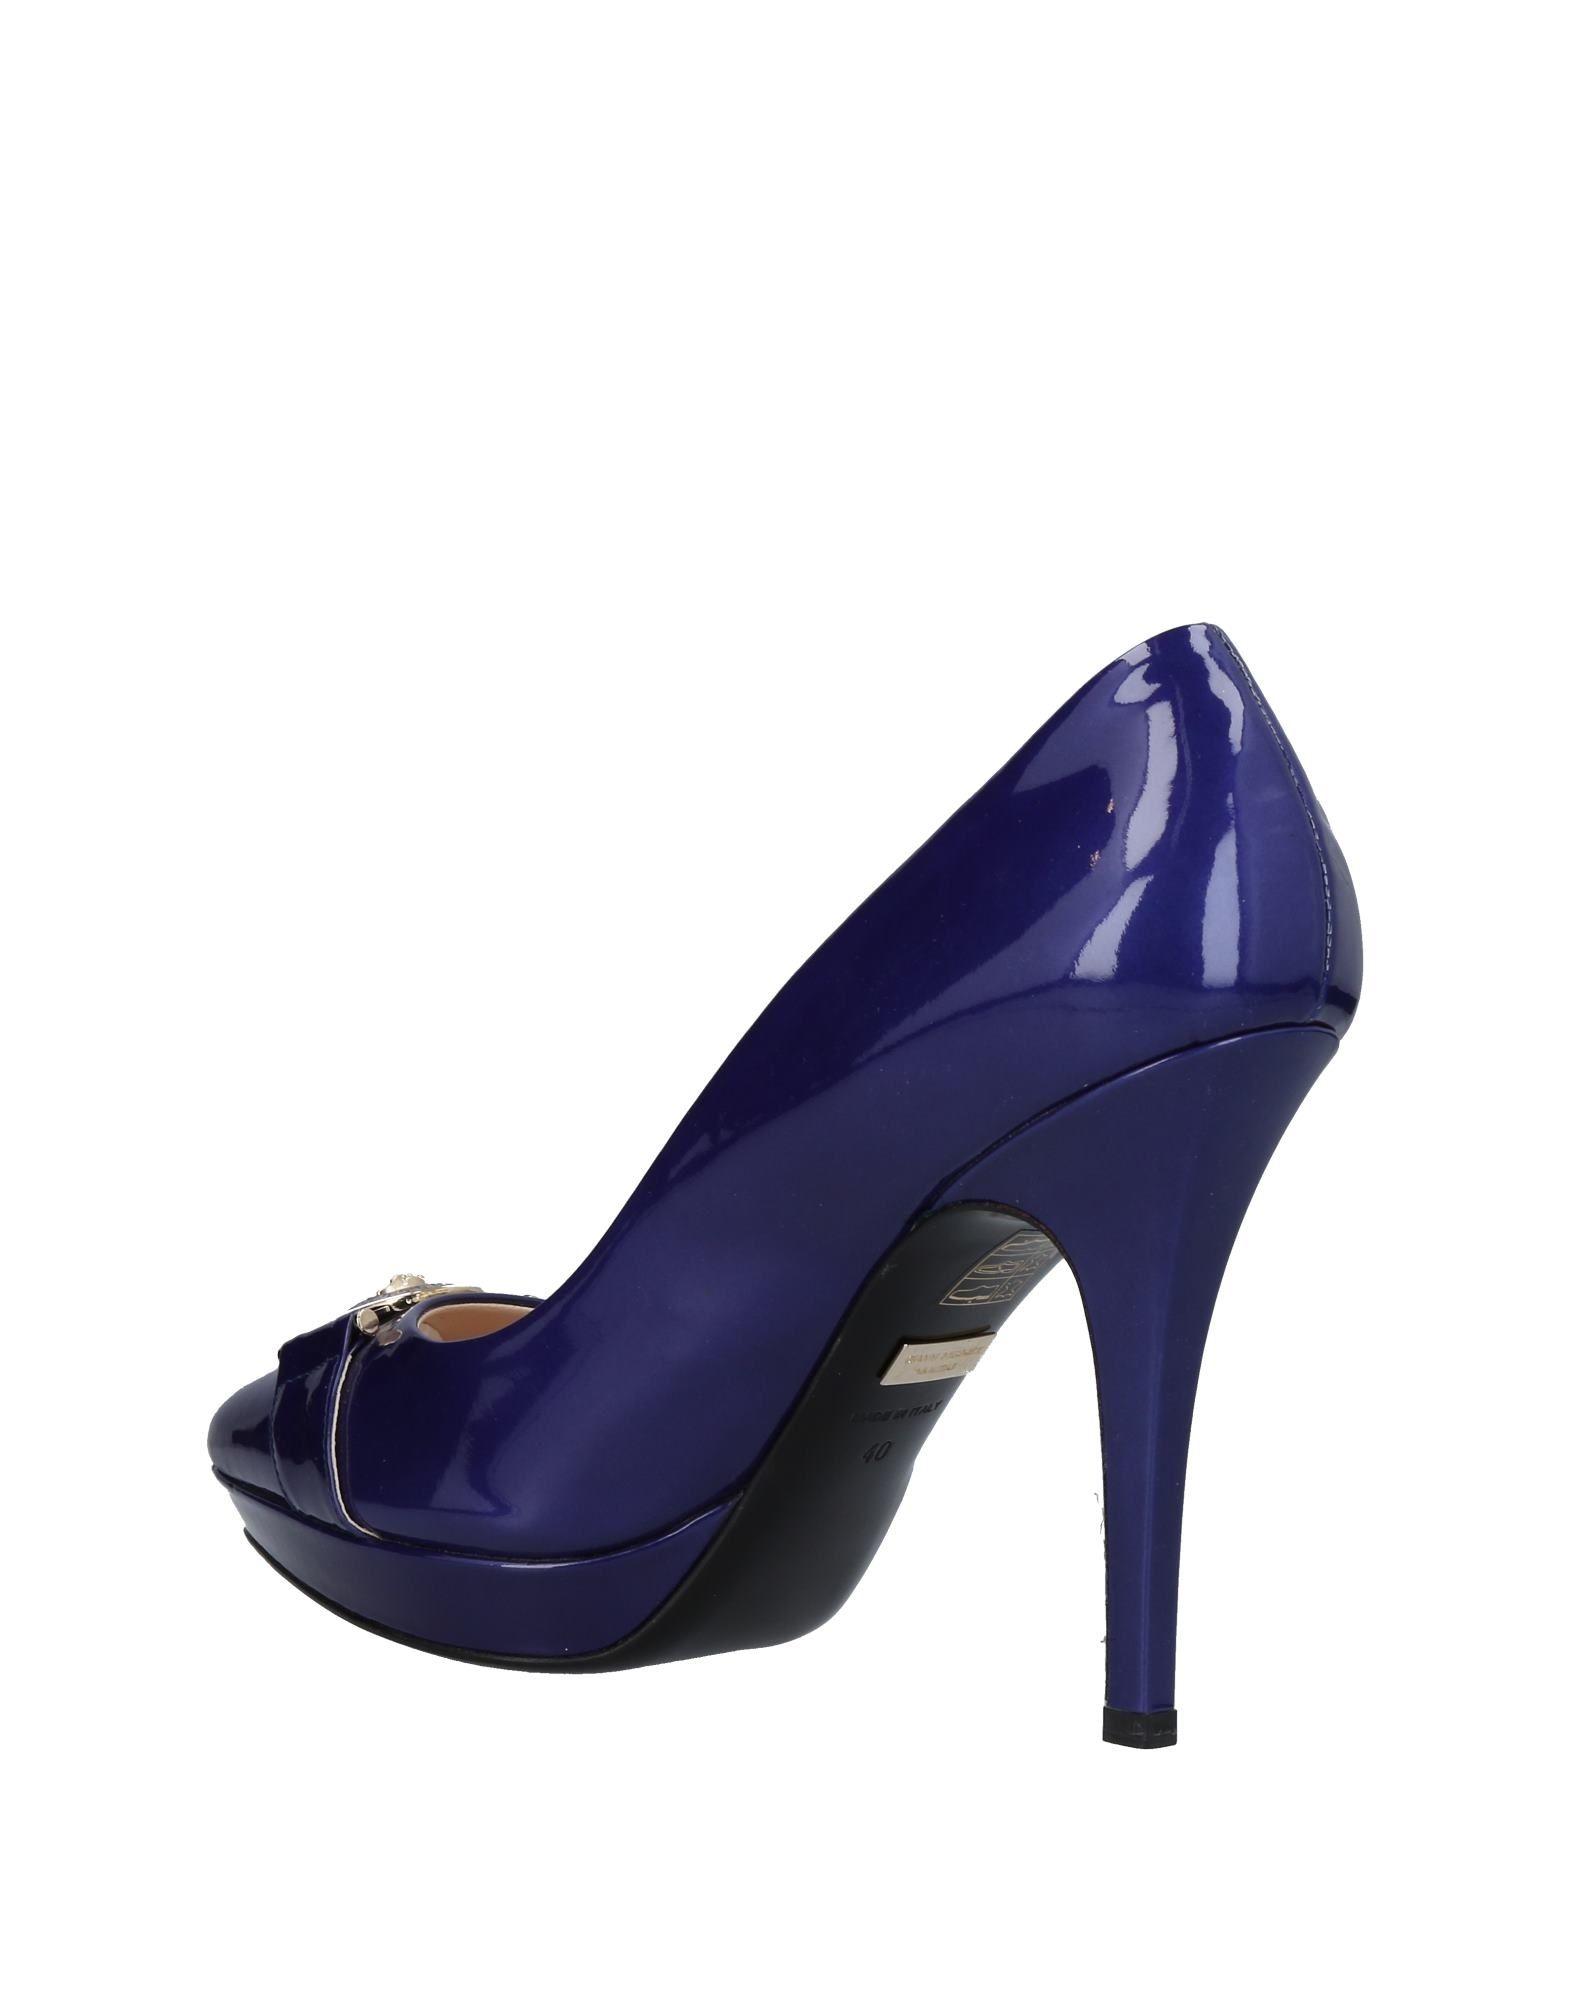 Versace Pumps Damen  11030294JLGünstige Schuhe gut aussehende Schuhe 11030294JLGünstige ea14da